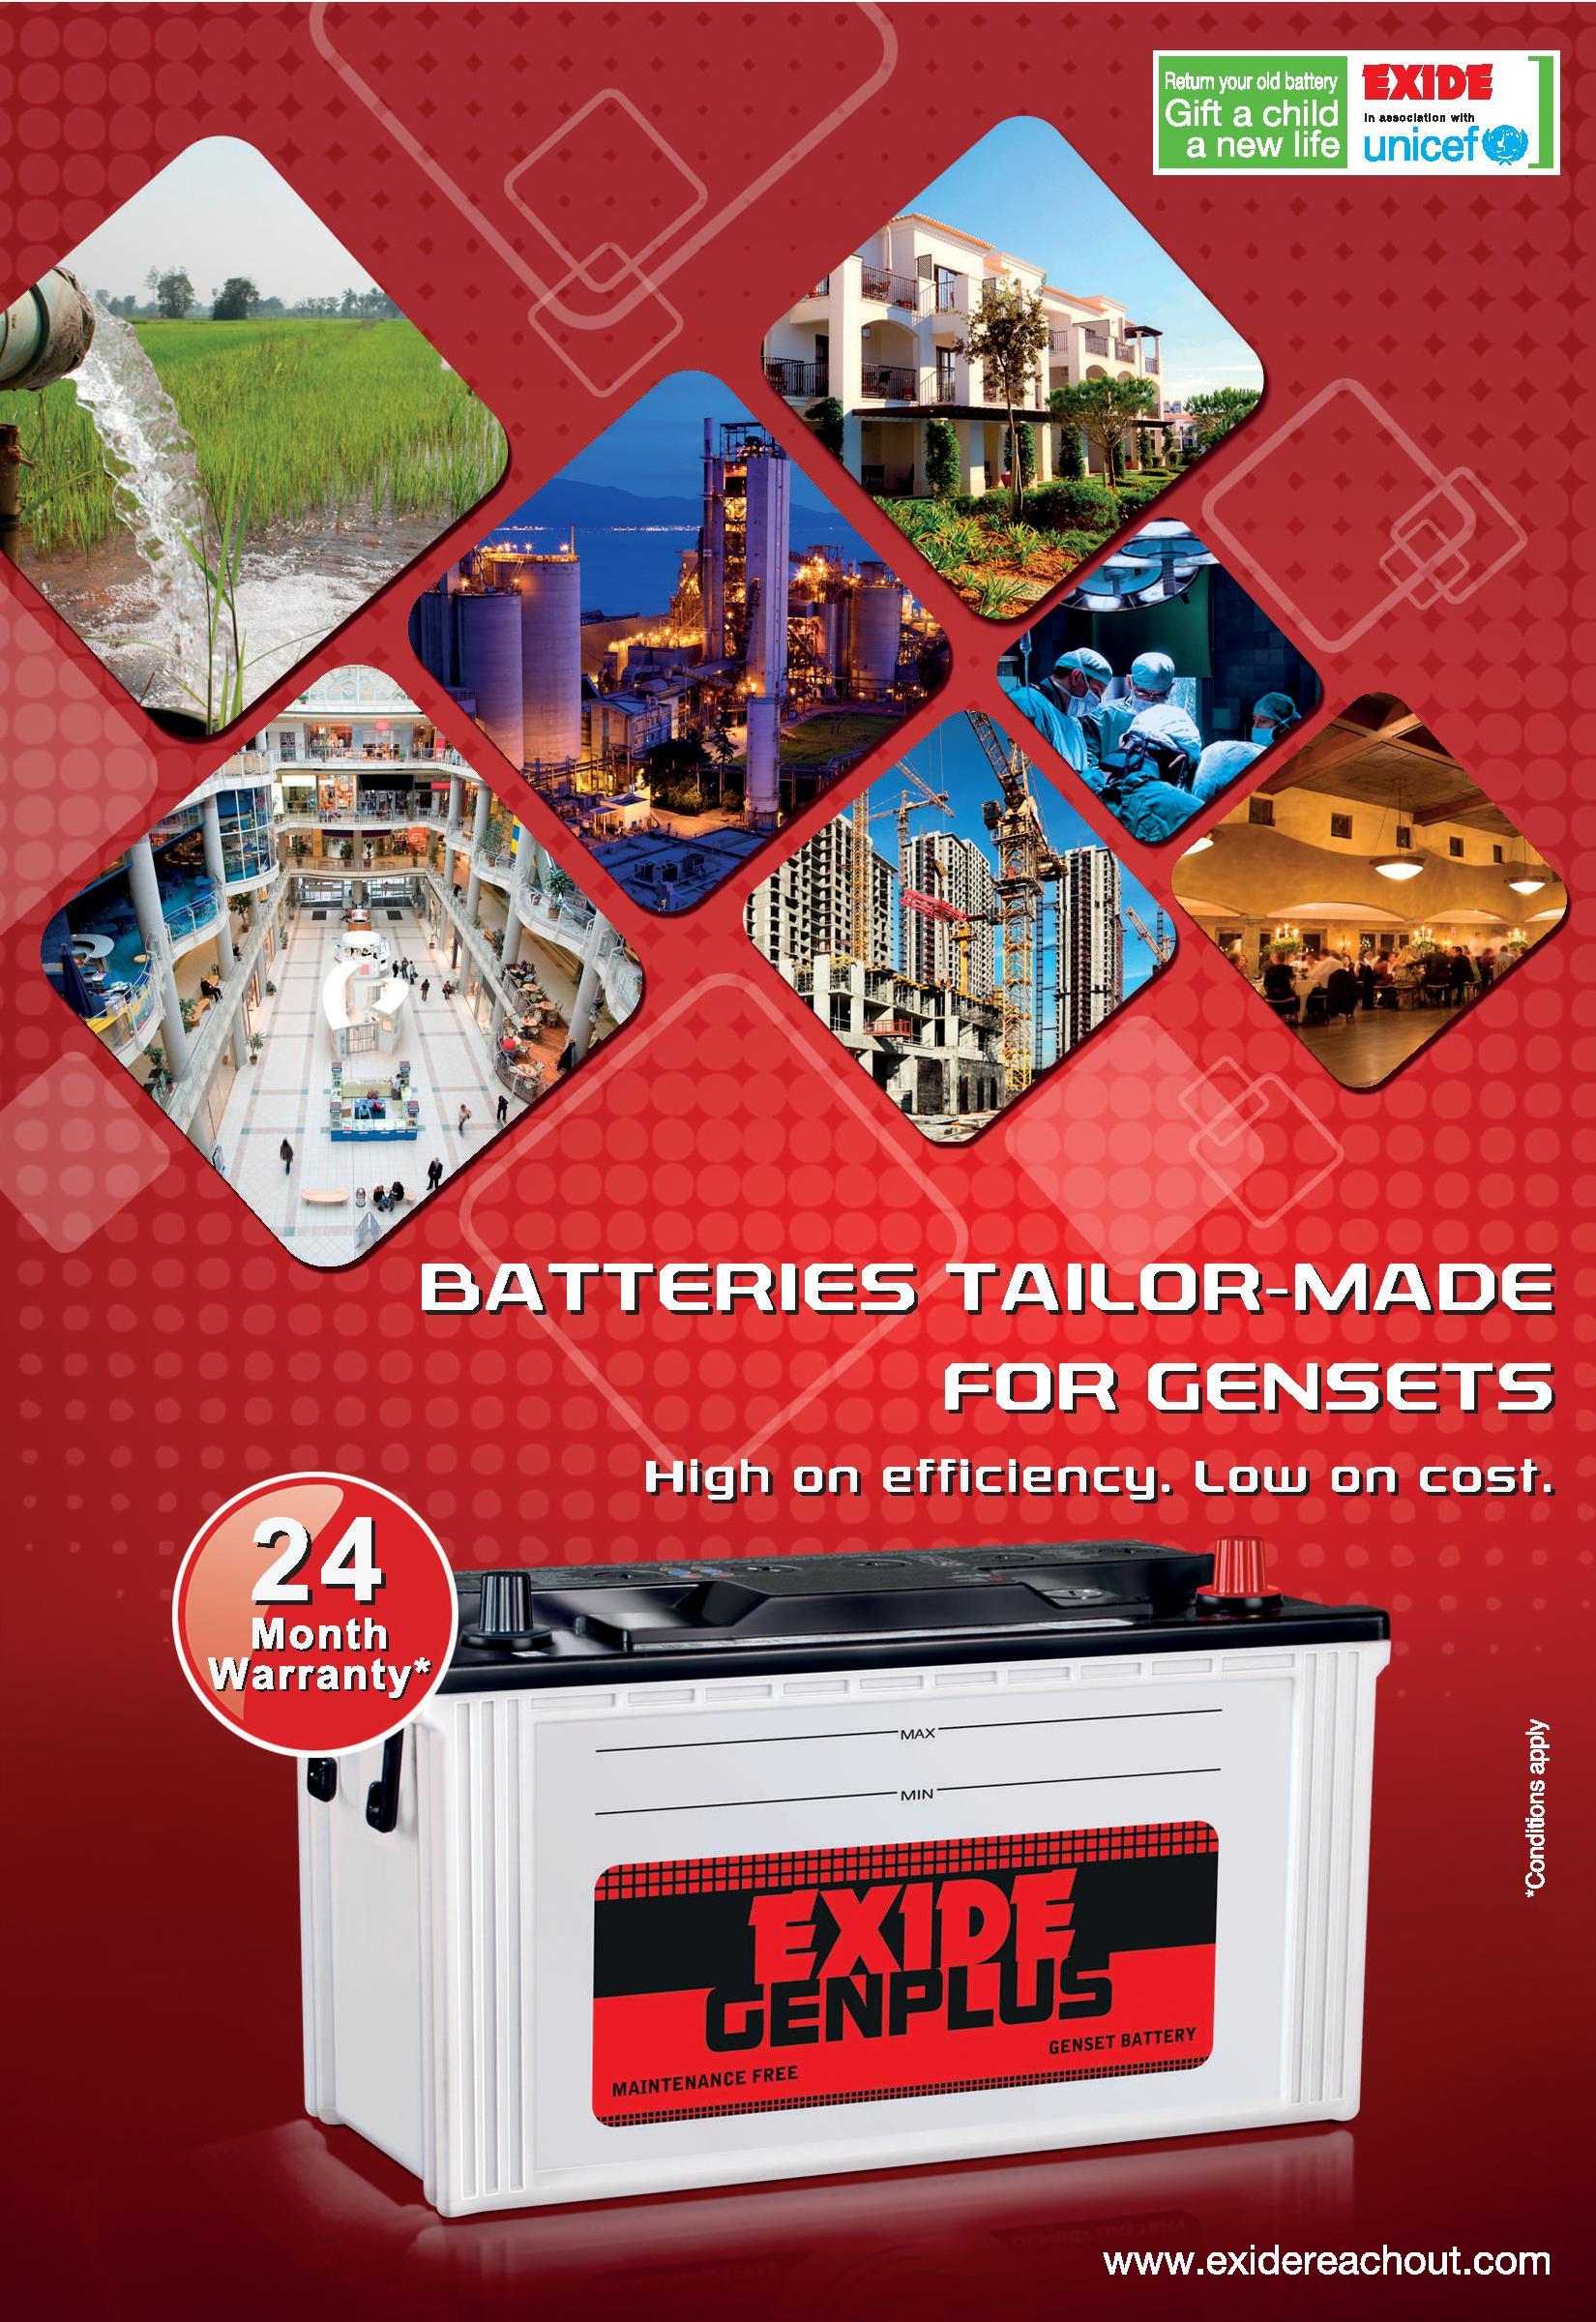 Exide Genplus Generator Battery